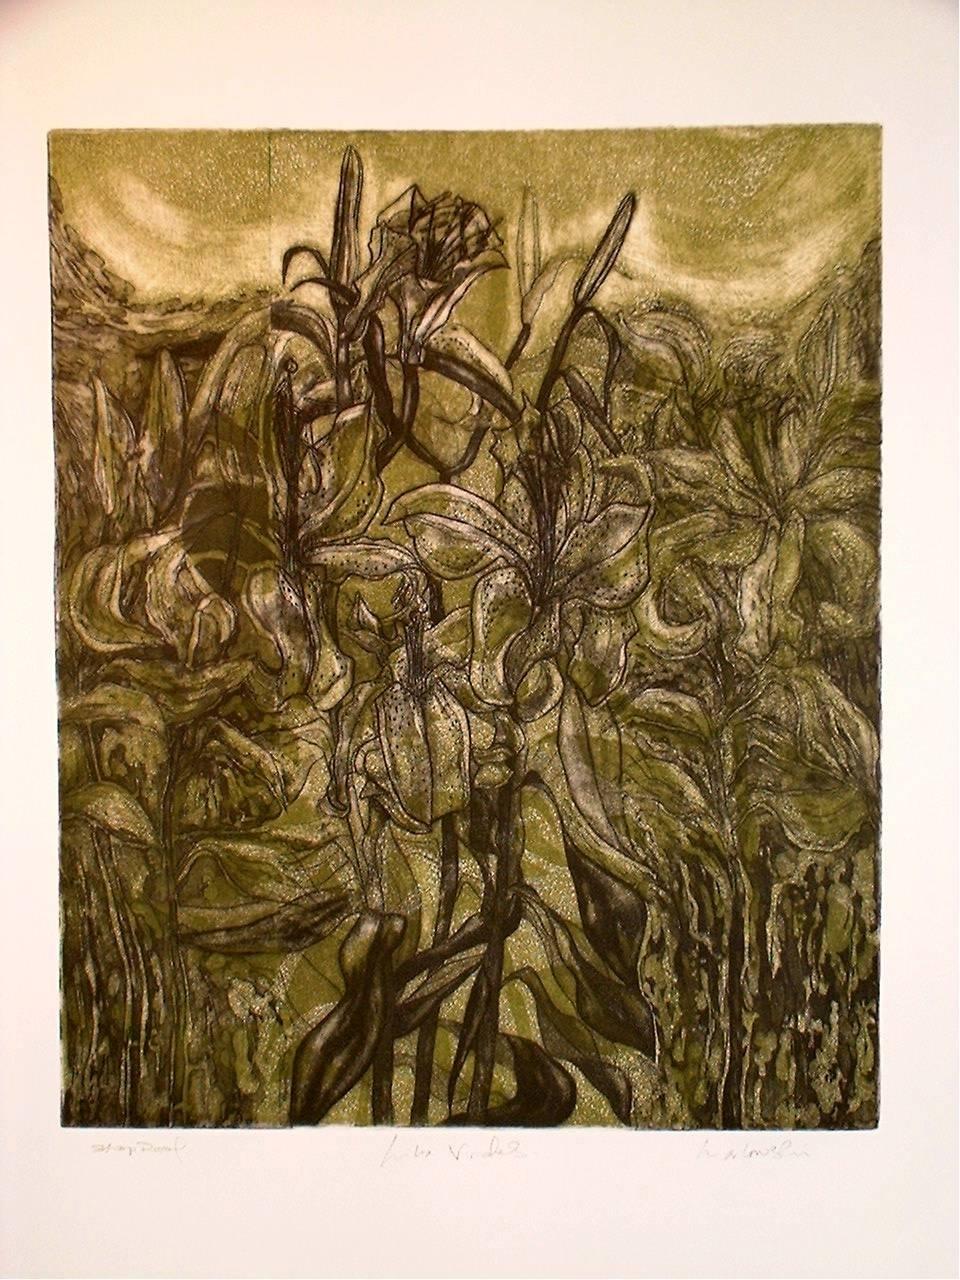 Lilia-Virides-3-plate-etching-460-x-380, by the artist Helena Orlowski